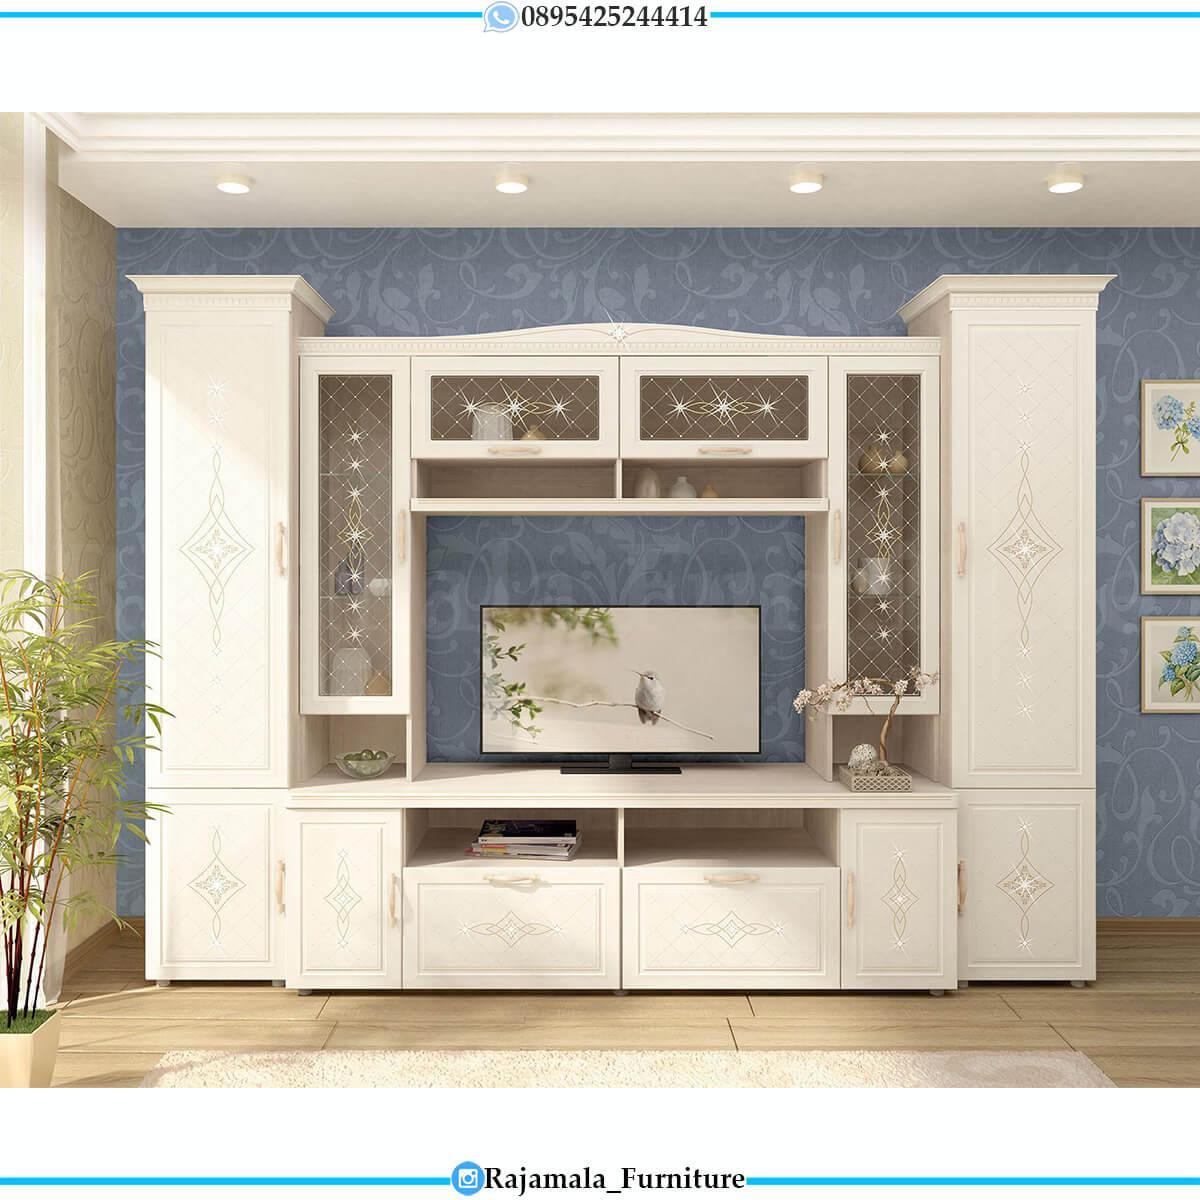 Harga Set Meja TV Minimalis Putih Jepara Luxury Classic RM-0659